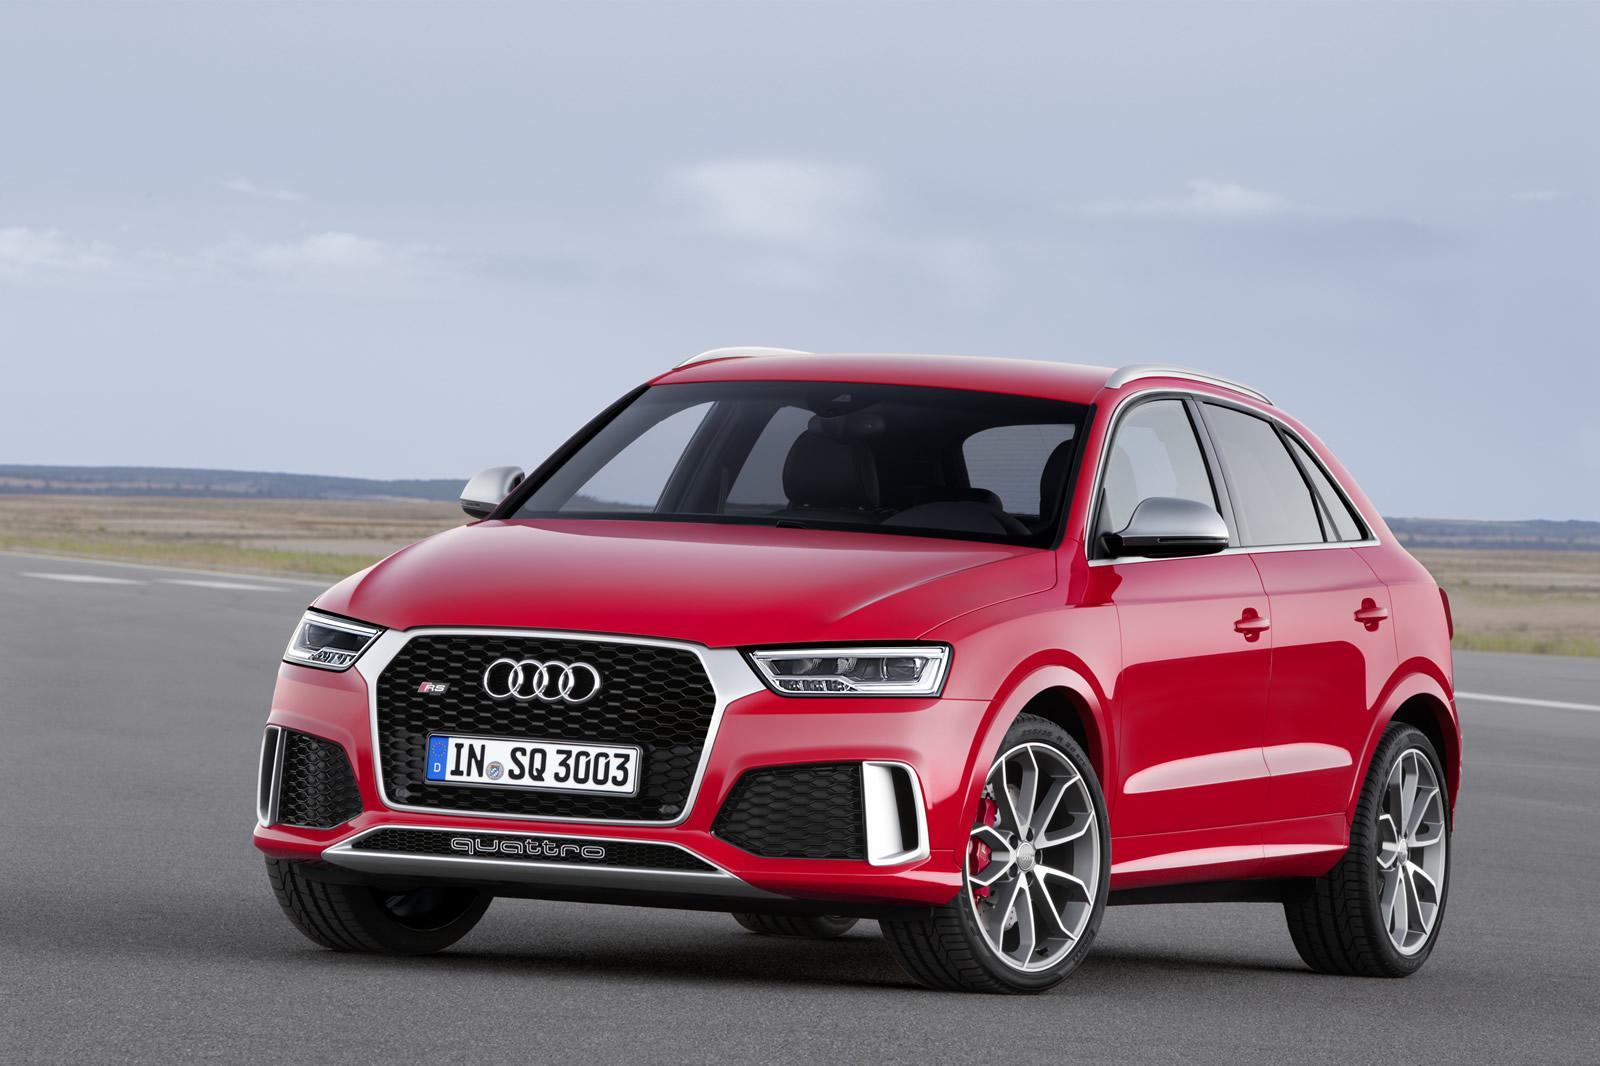 2015 Audi RS Q3 facelift front grille